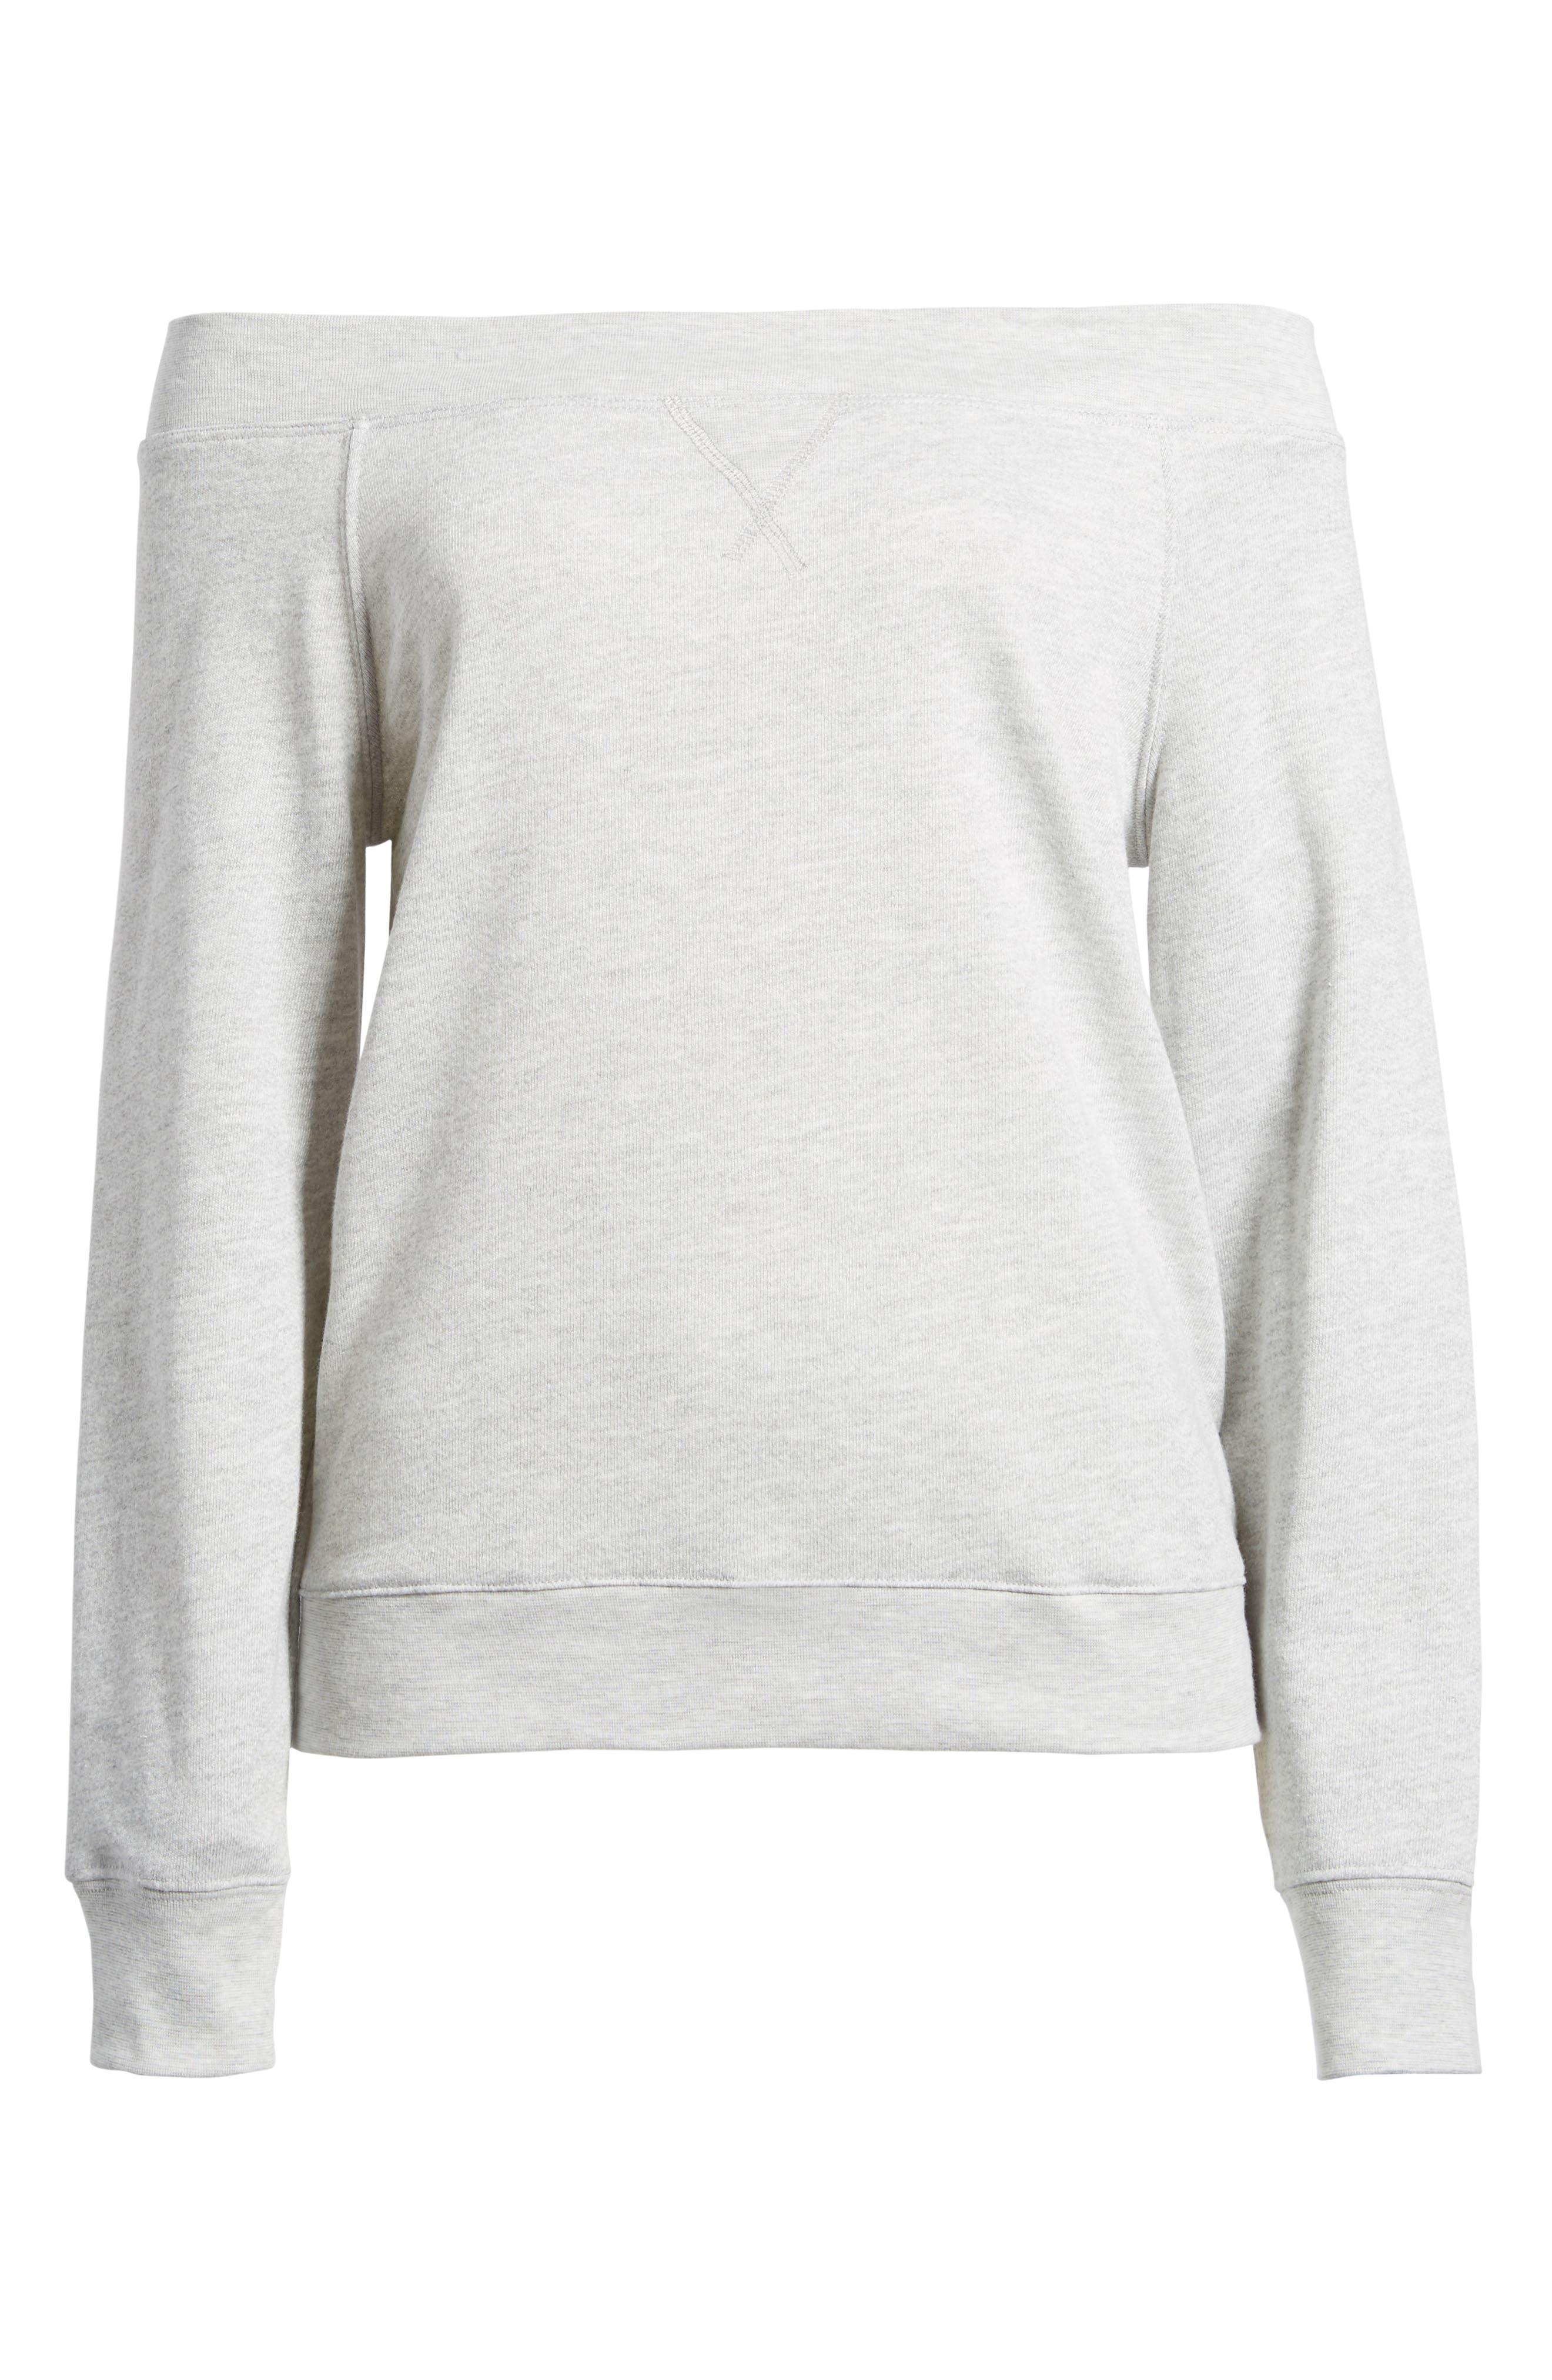 Off the Shoulder Sweatshirt,                             Alternate thumbnail 6, color,                             020